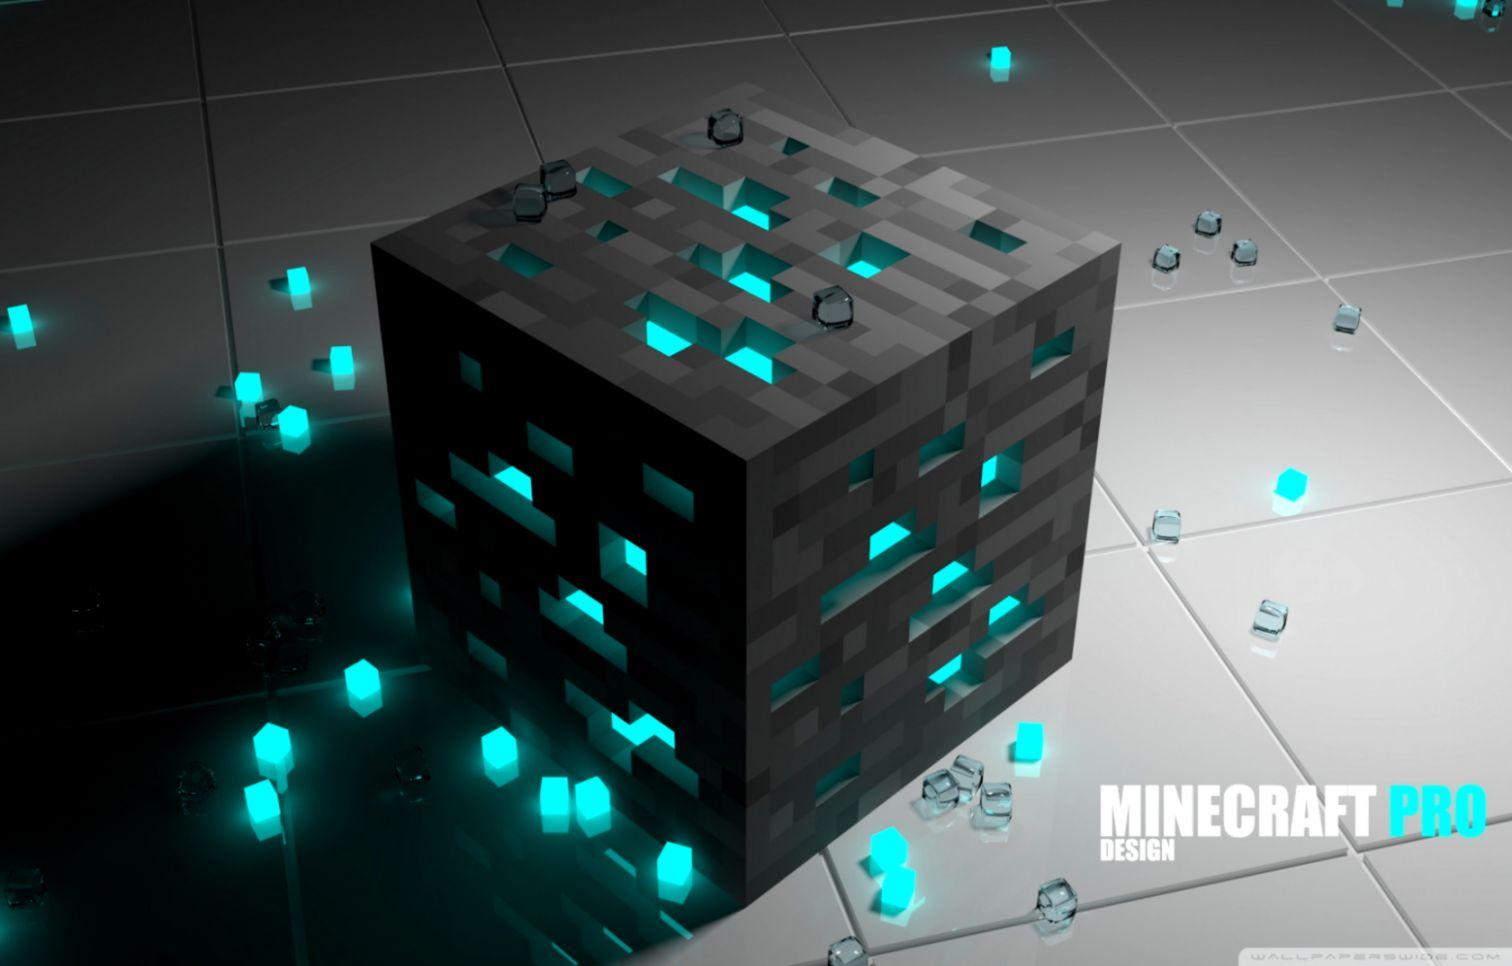 Minecraft Wallpaper 4k Hd